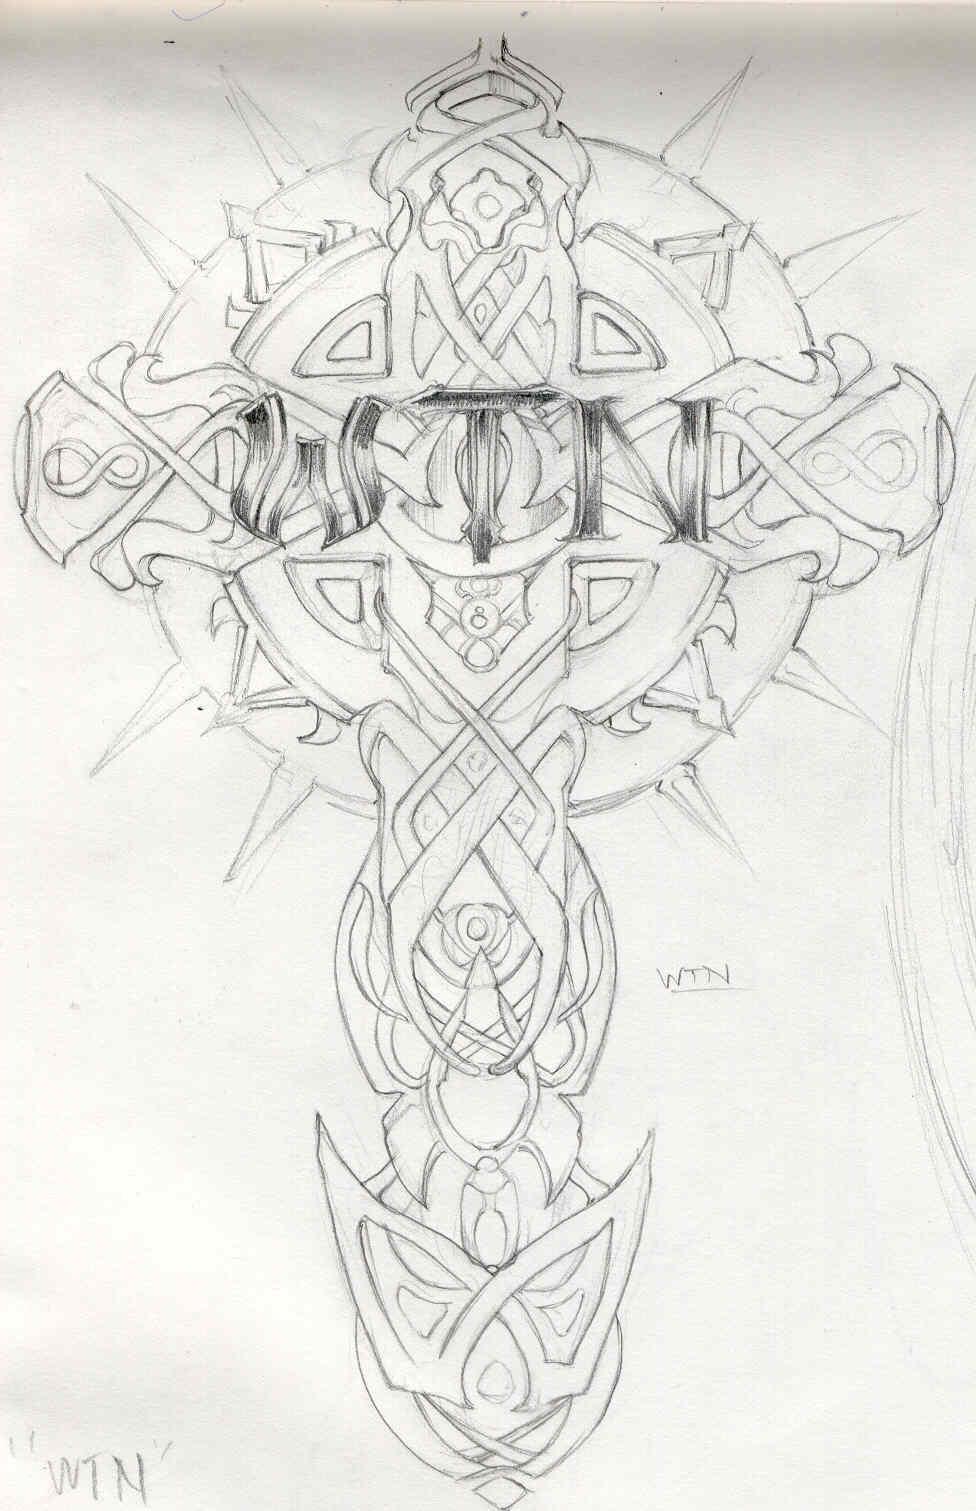 http://img04.deviantart.net/cc0b/i/2004/351/6/b/cross_tattoo_4_brandon_by_biomechlizardchick.jpg Cross Tattoo Drawings In Pencil